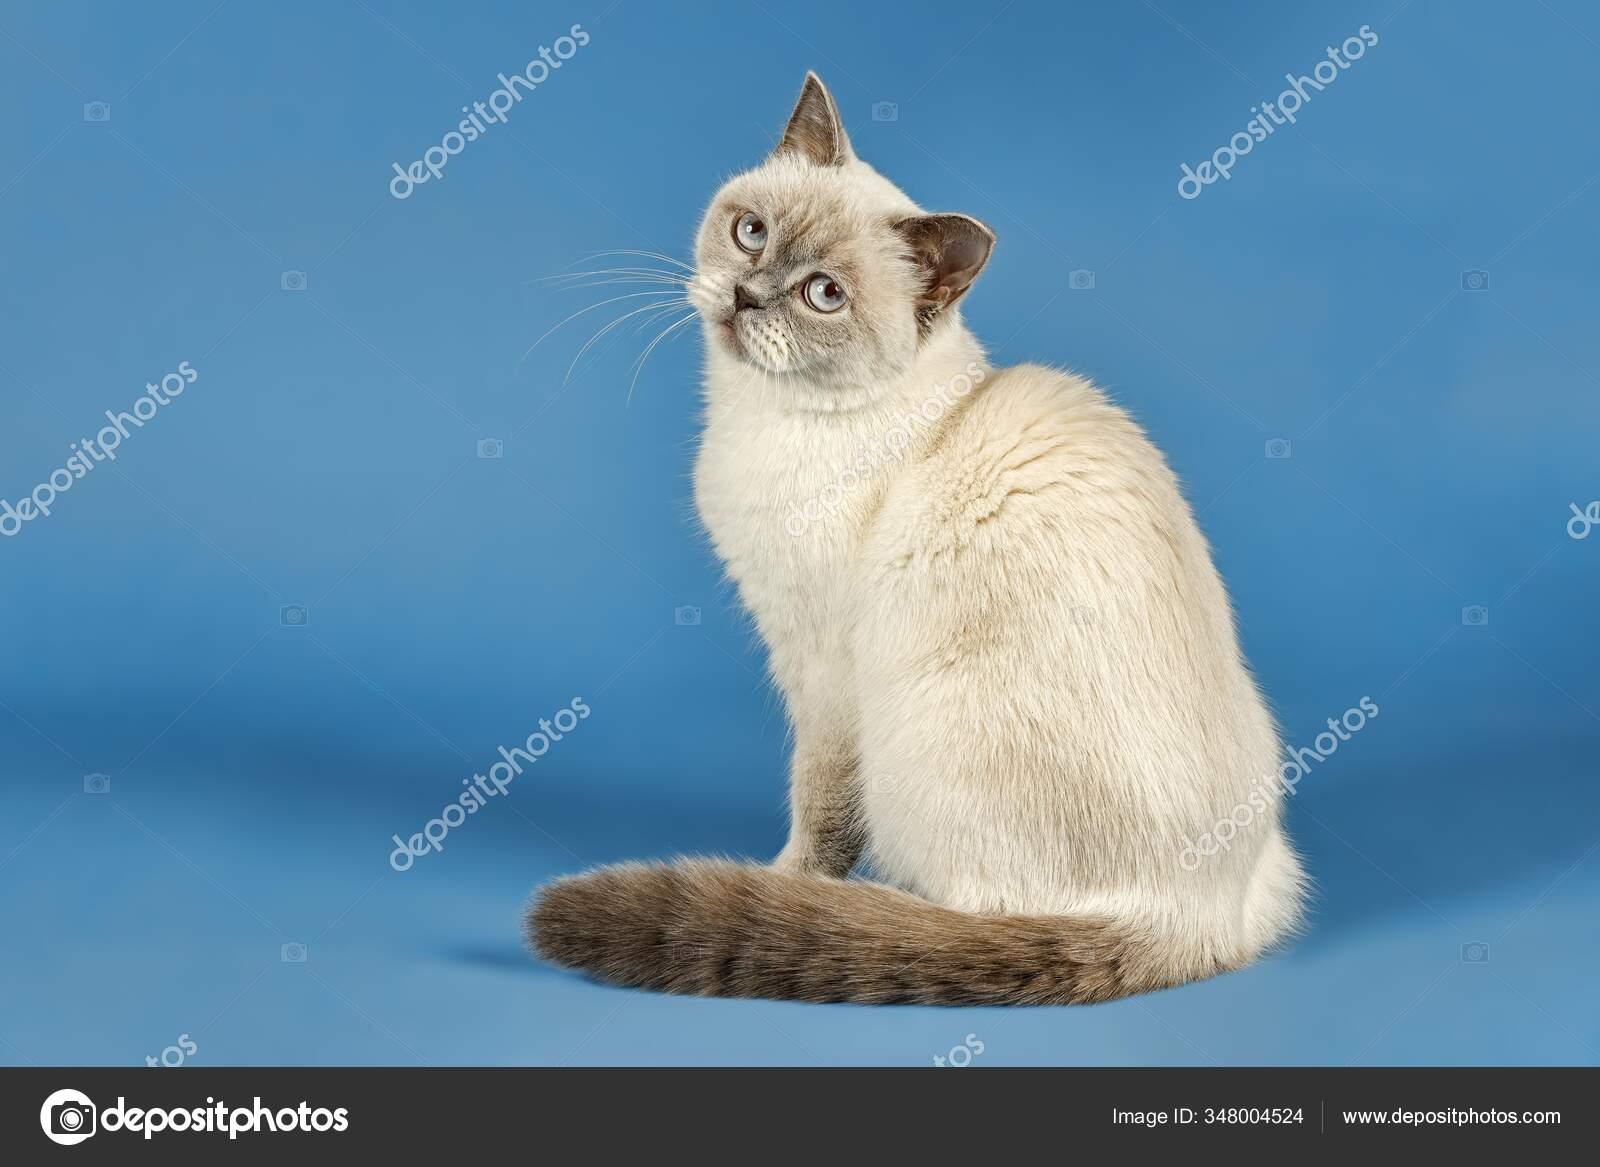 British Shorthair Cat Years Colour Lilac Point Stock Photo C Imagebrokermicrostock 348004524